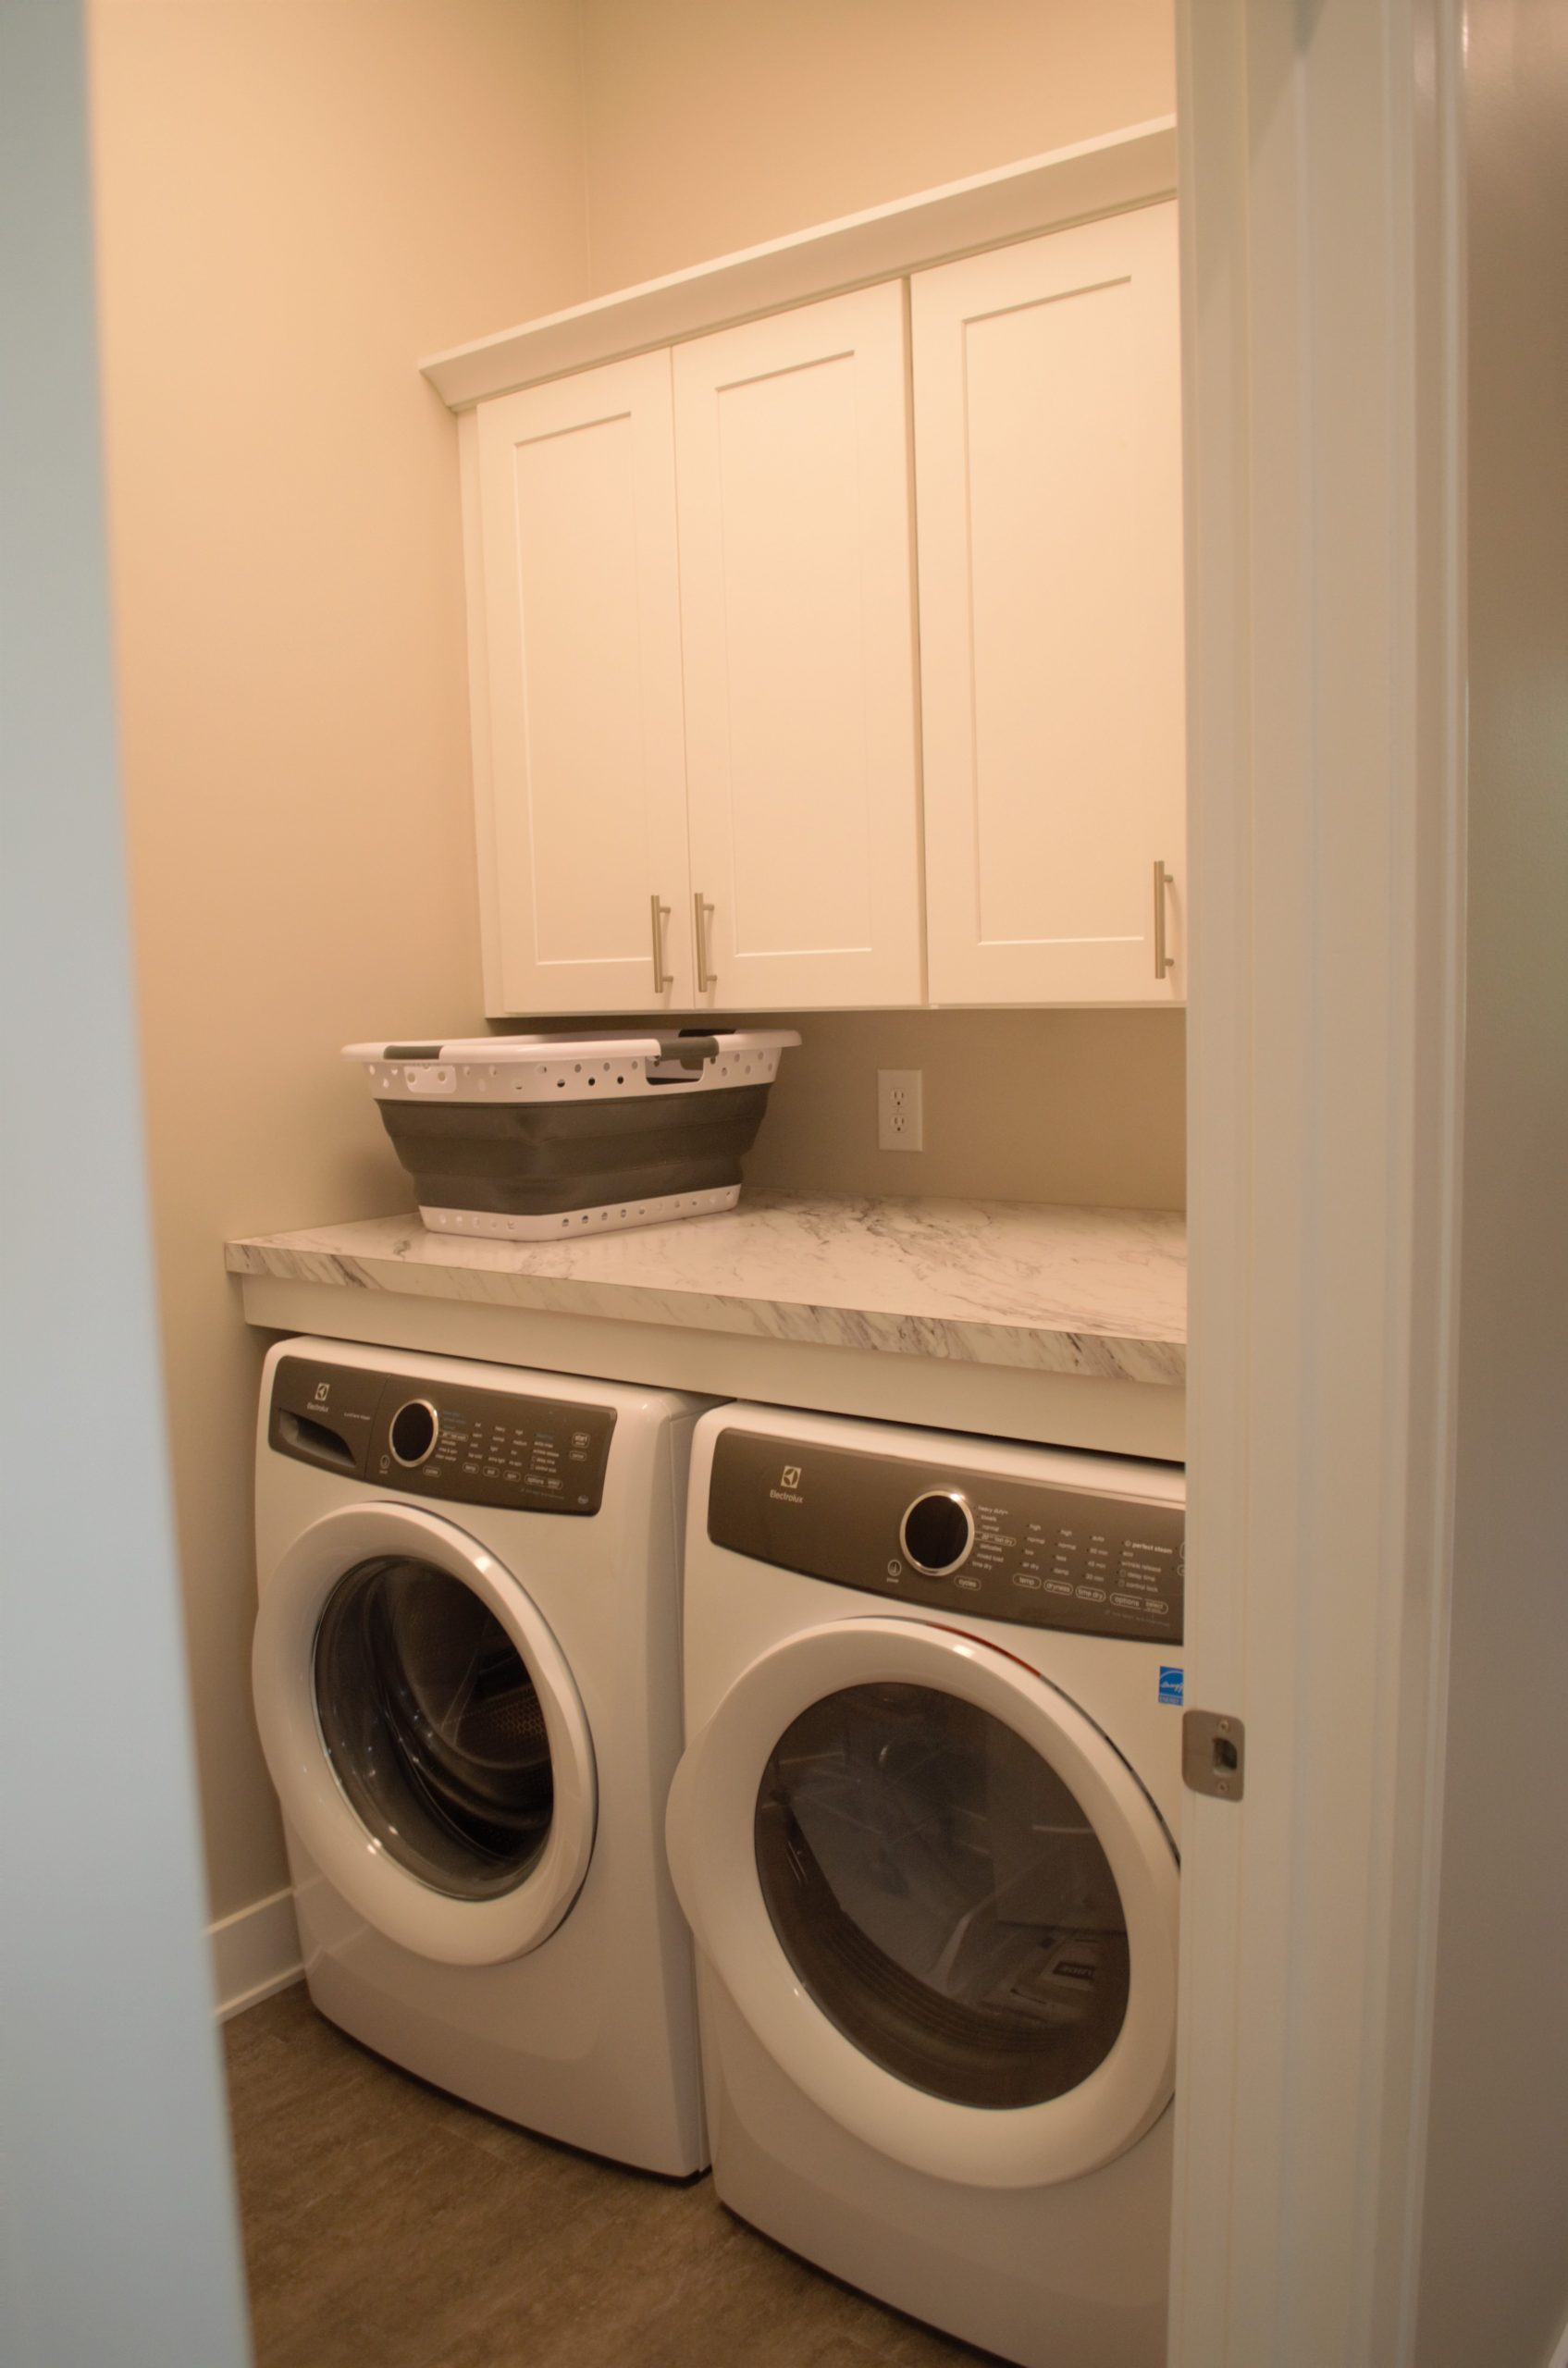 SPS laundry